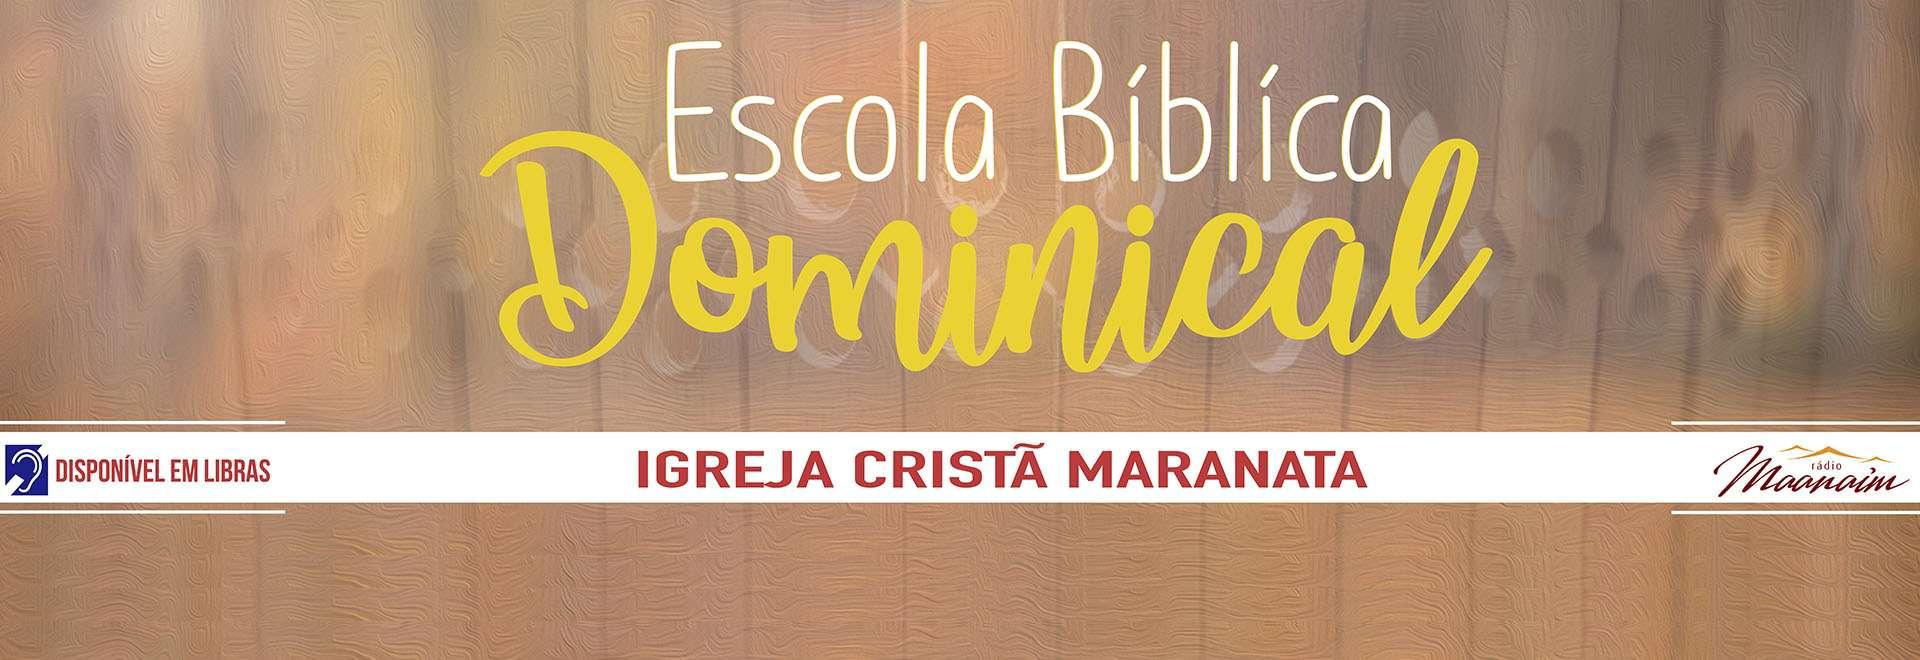 Participações da EBD da Igreja Cristã Maranata - 30/08/2020